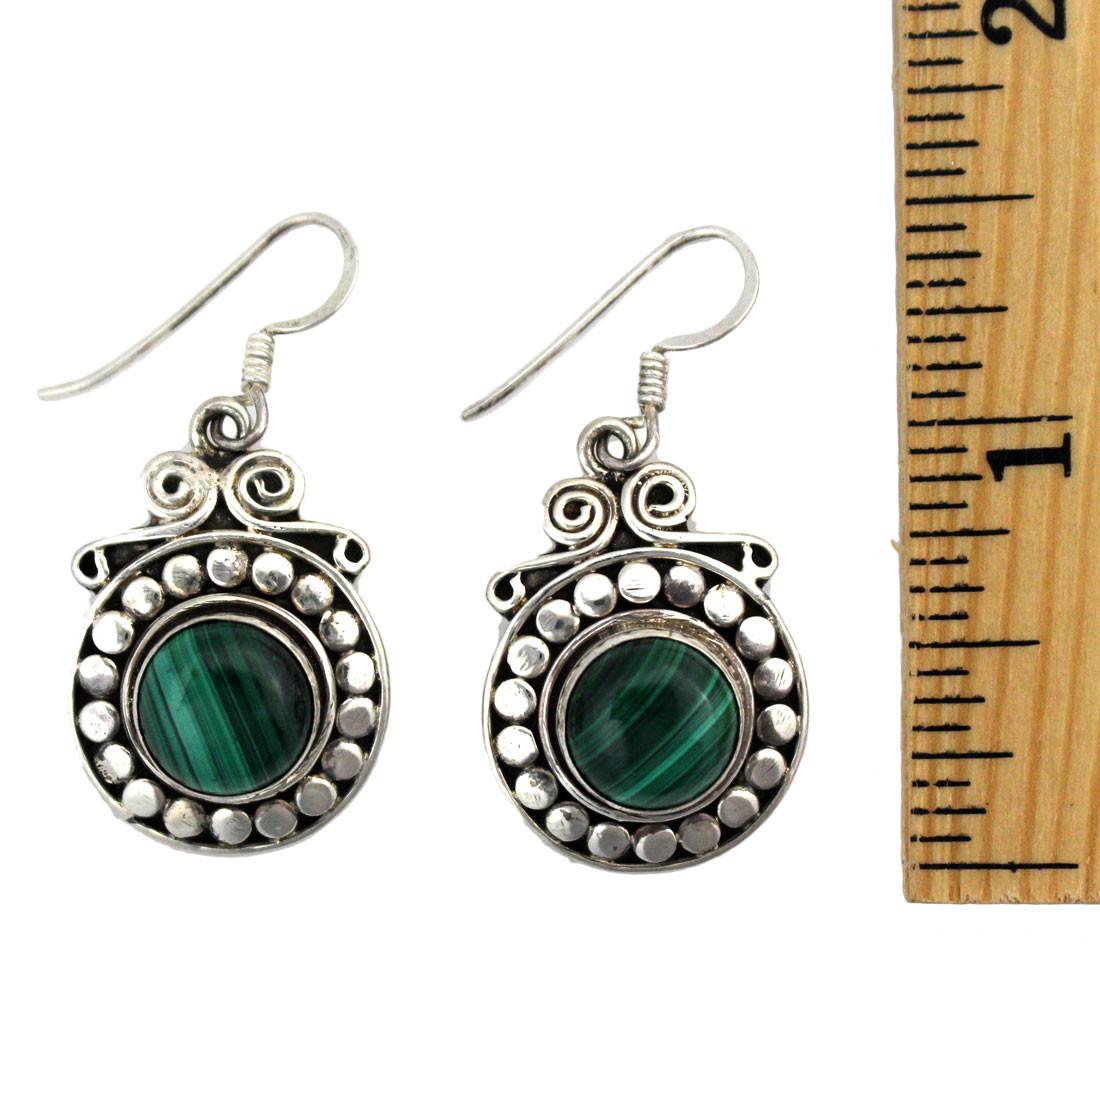 Green Malachite earrings measured to show size.